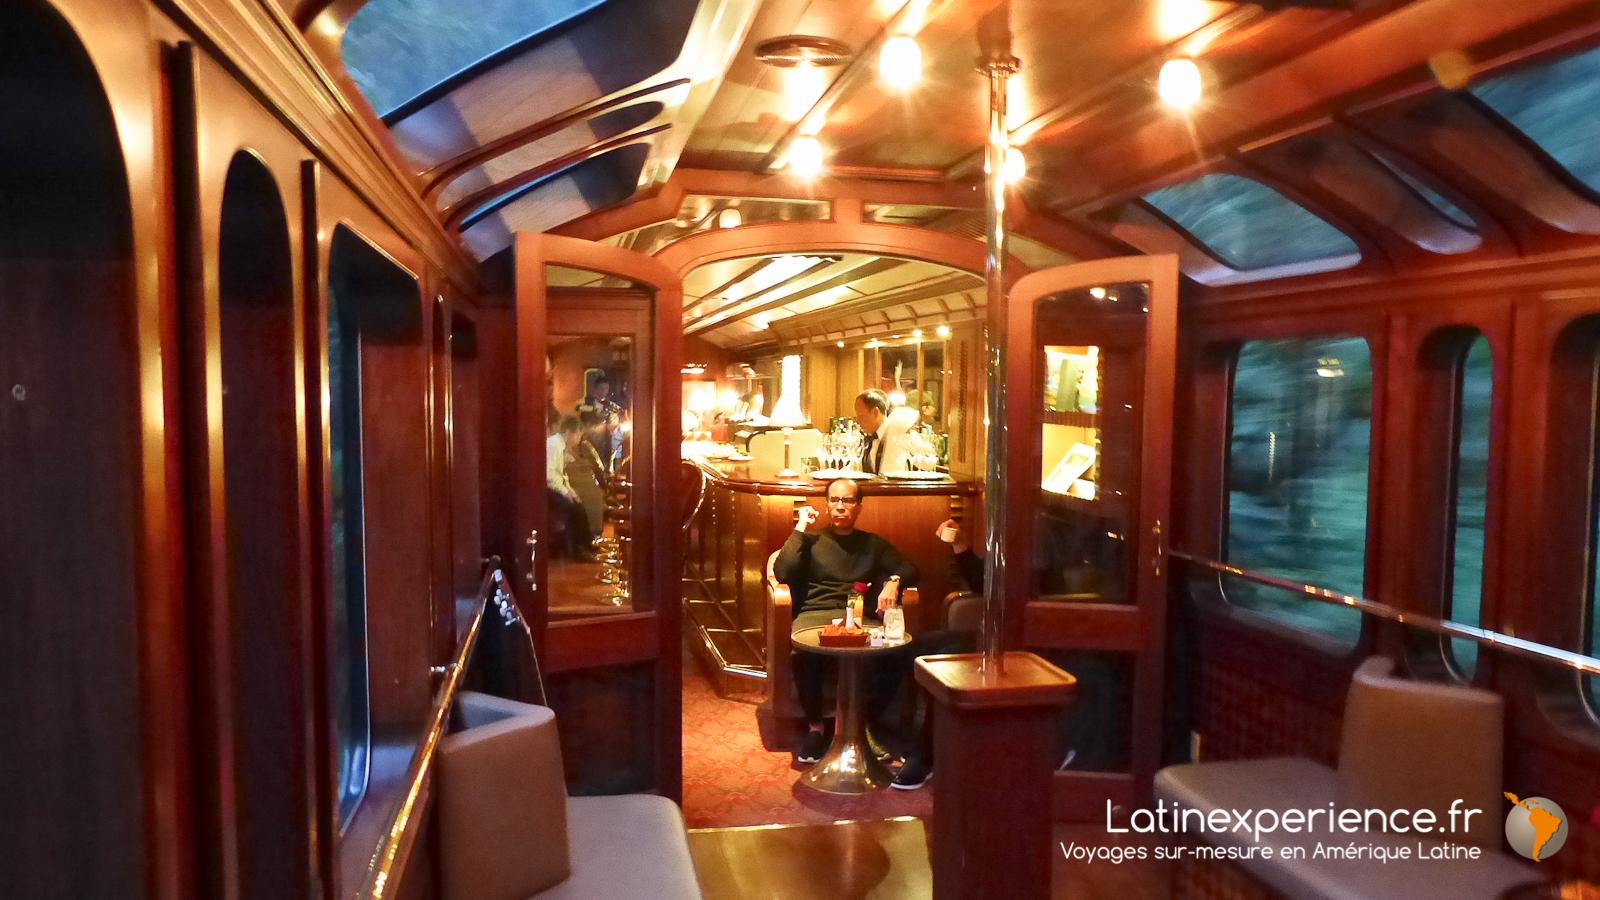 Pérou - Train Hiram Bingham  - Latinexperience Voyages